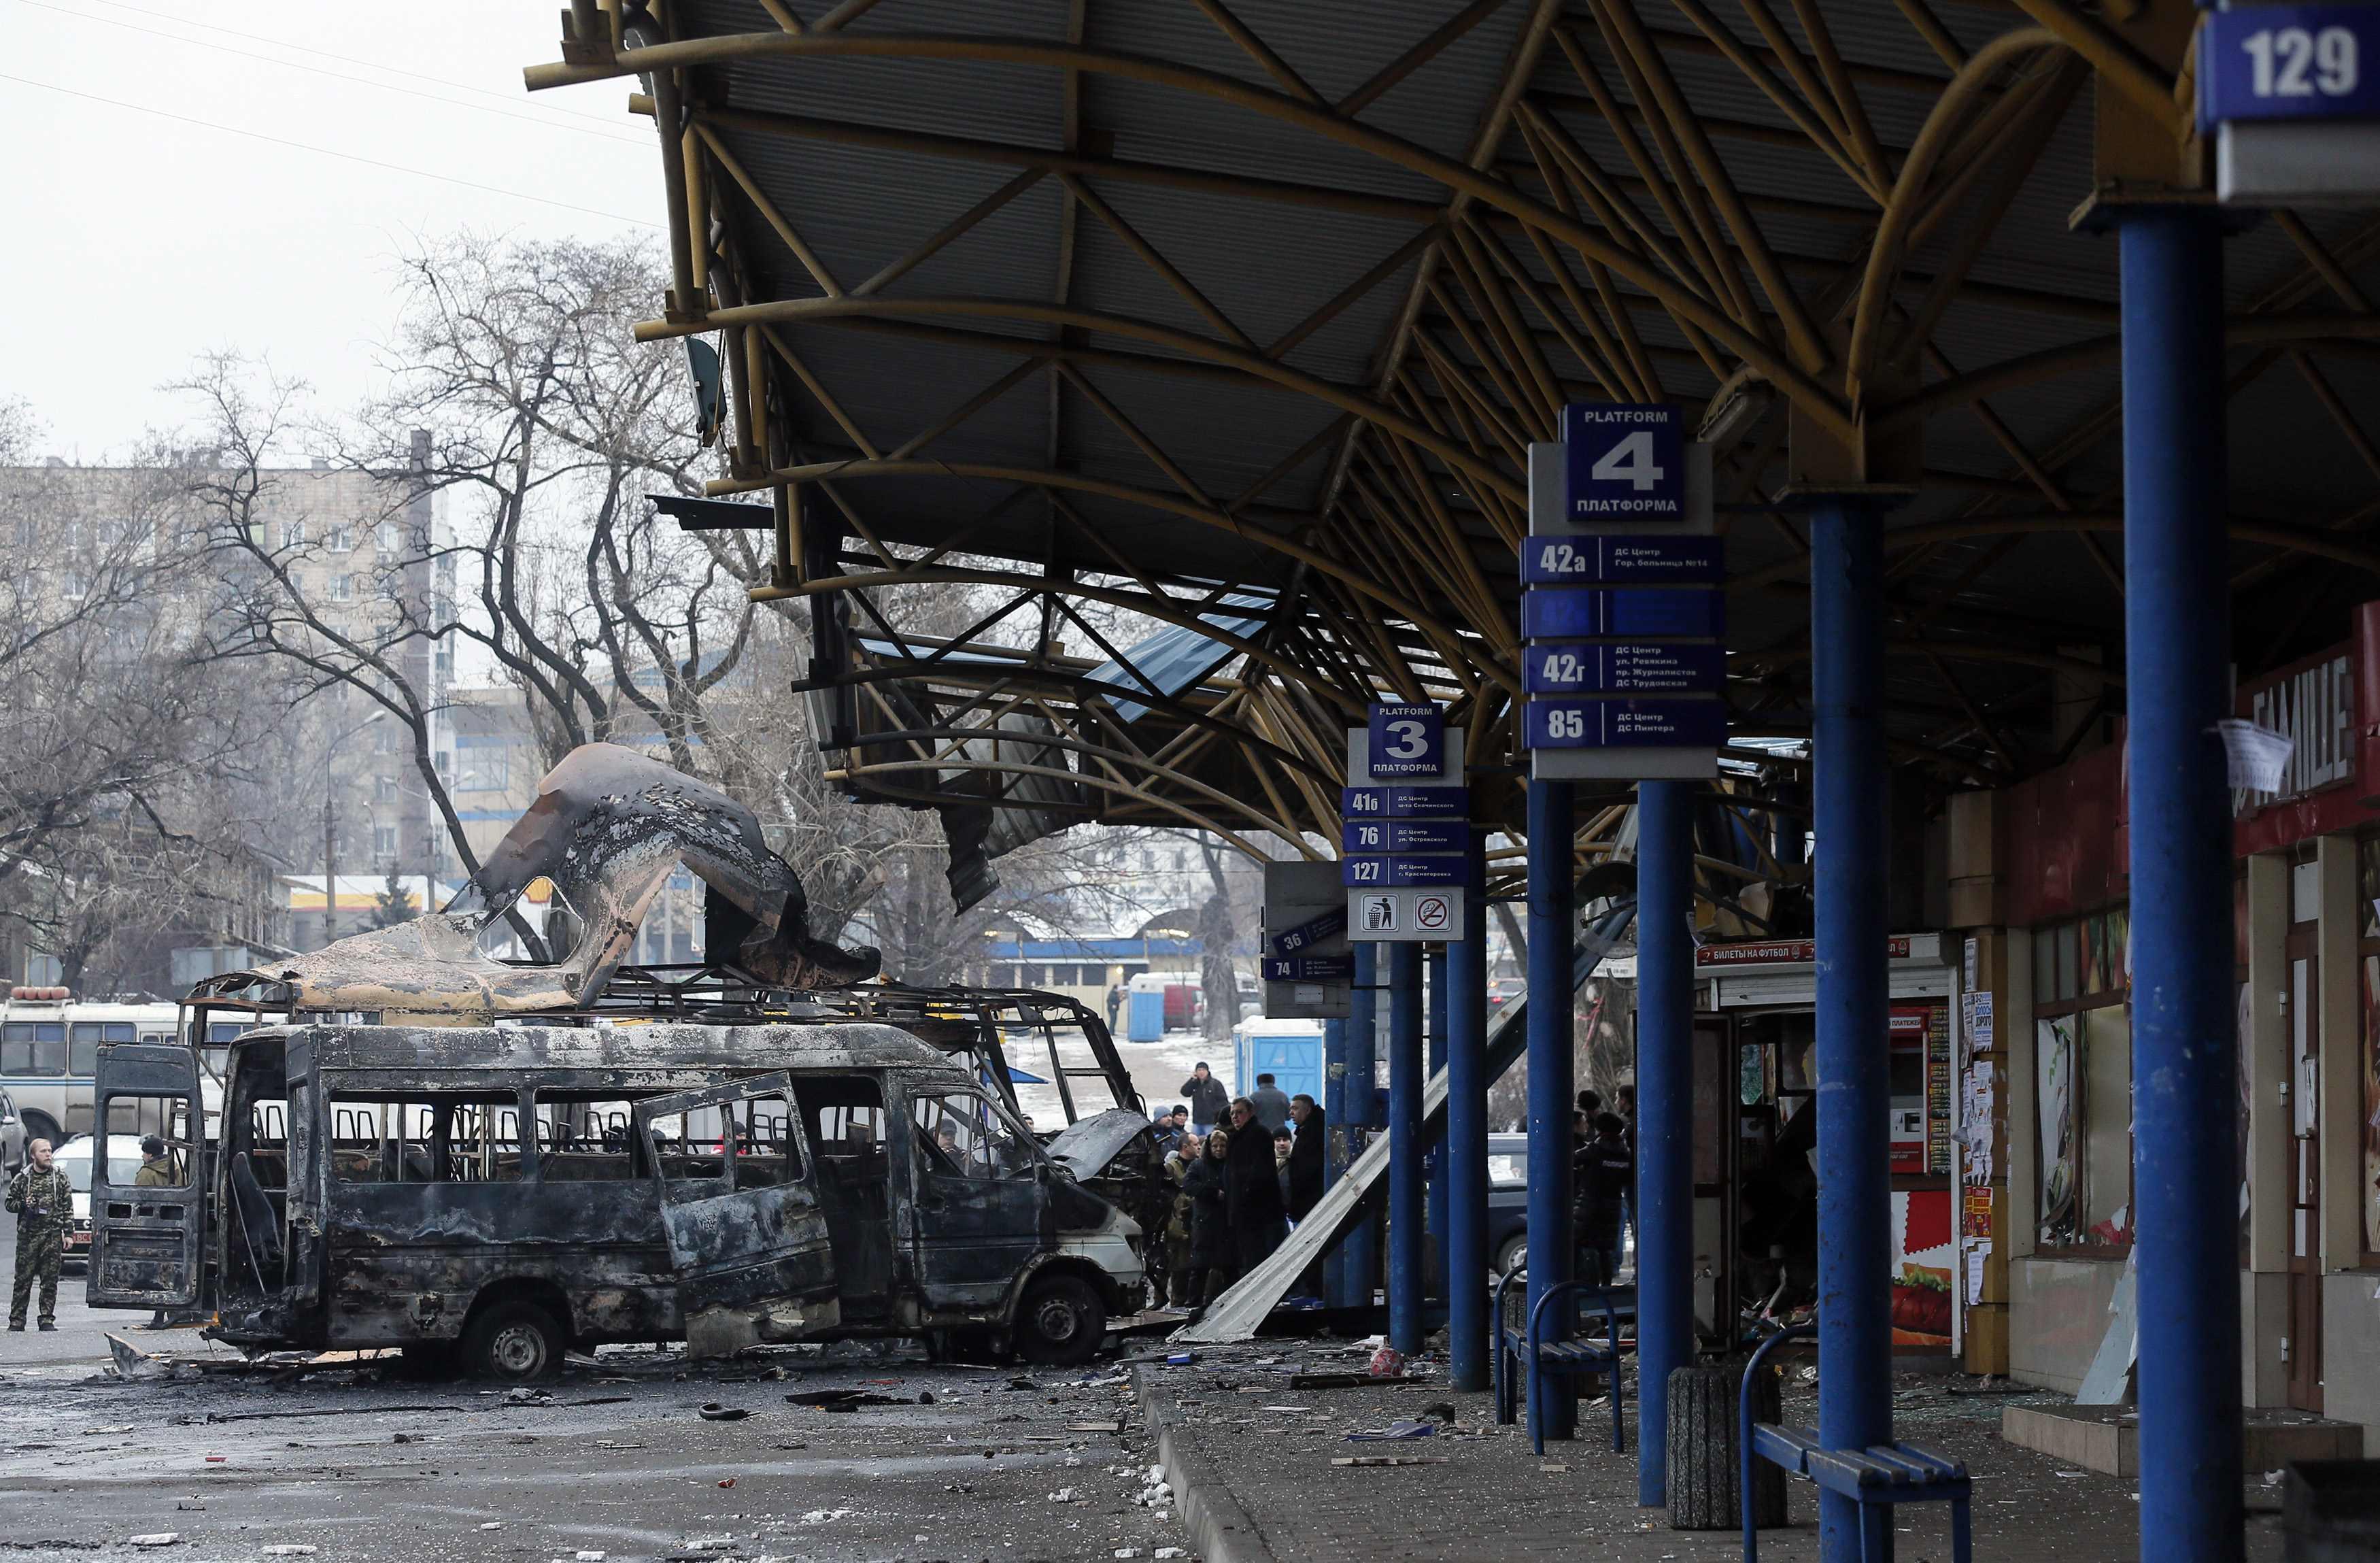 В центре Донецка обстреляли автостанцию (ФОТО, ВИДЕО)